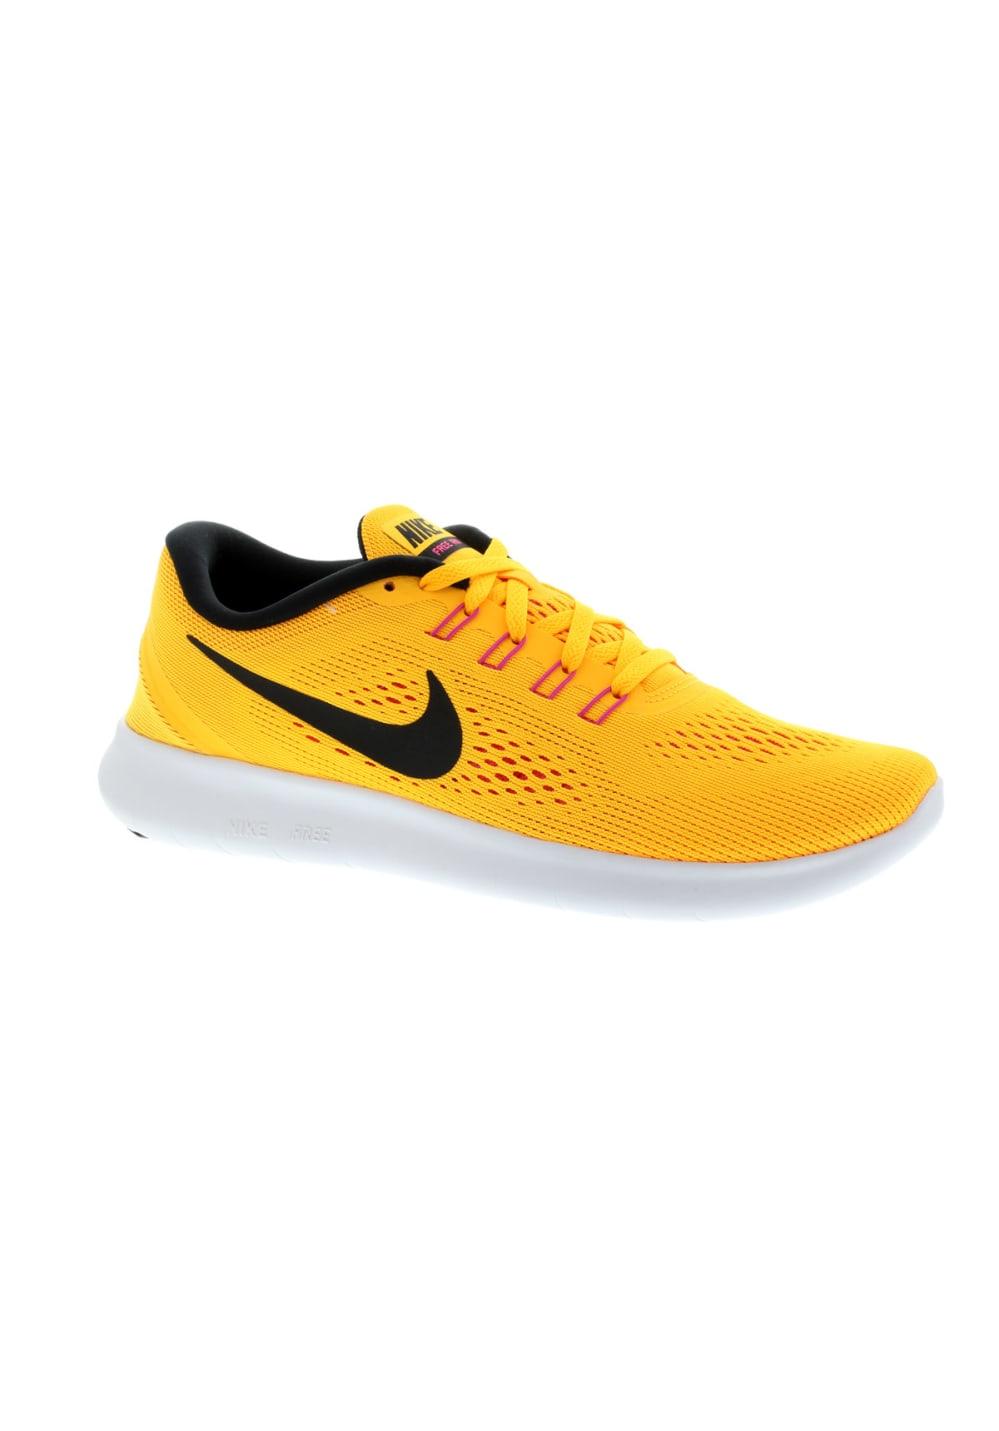 plus récent 934e6 1da52 Nike Free RN - Chaussures running pour Femme - Jaune